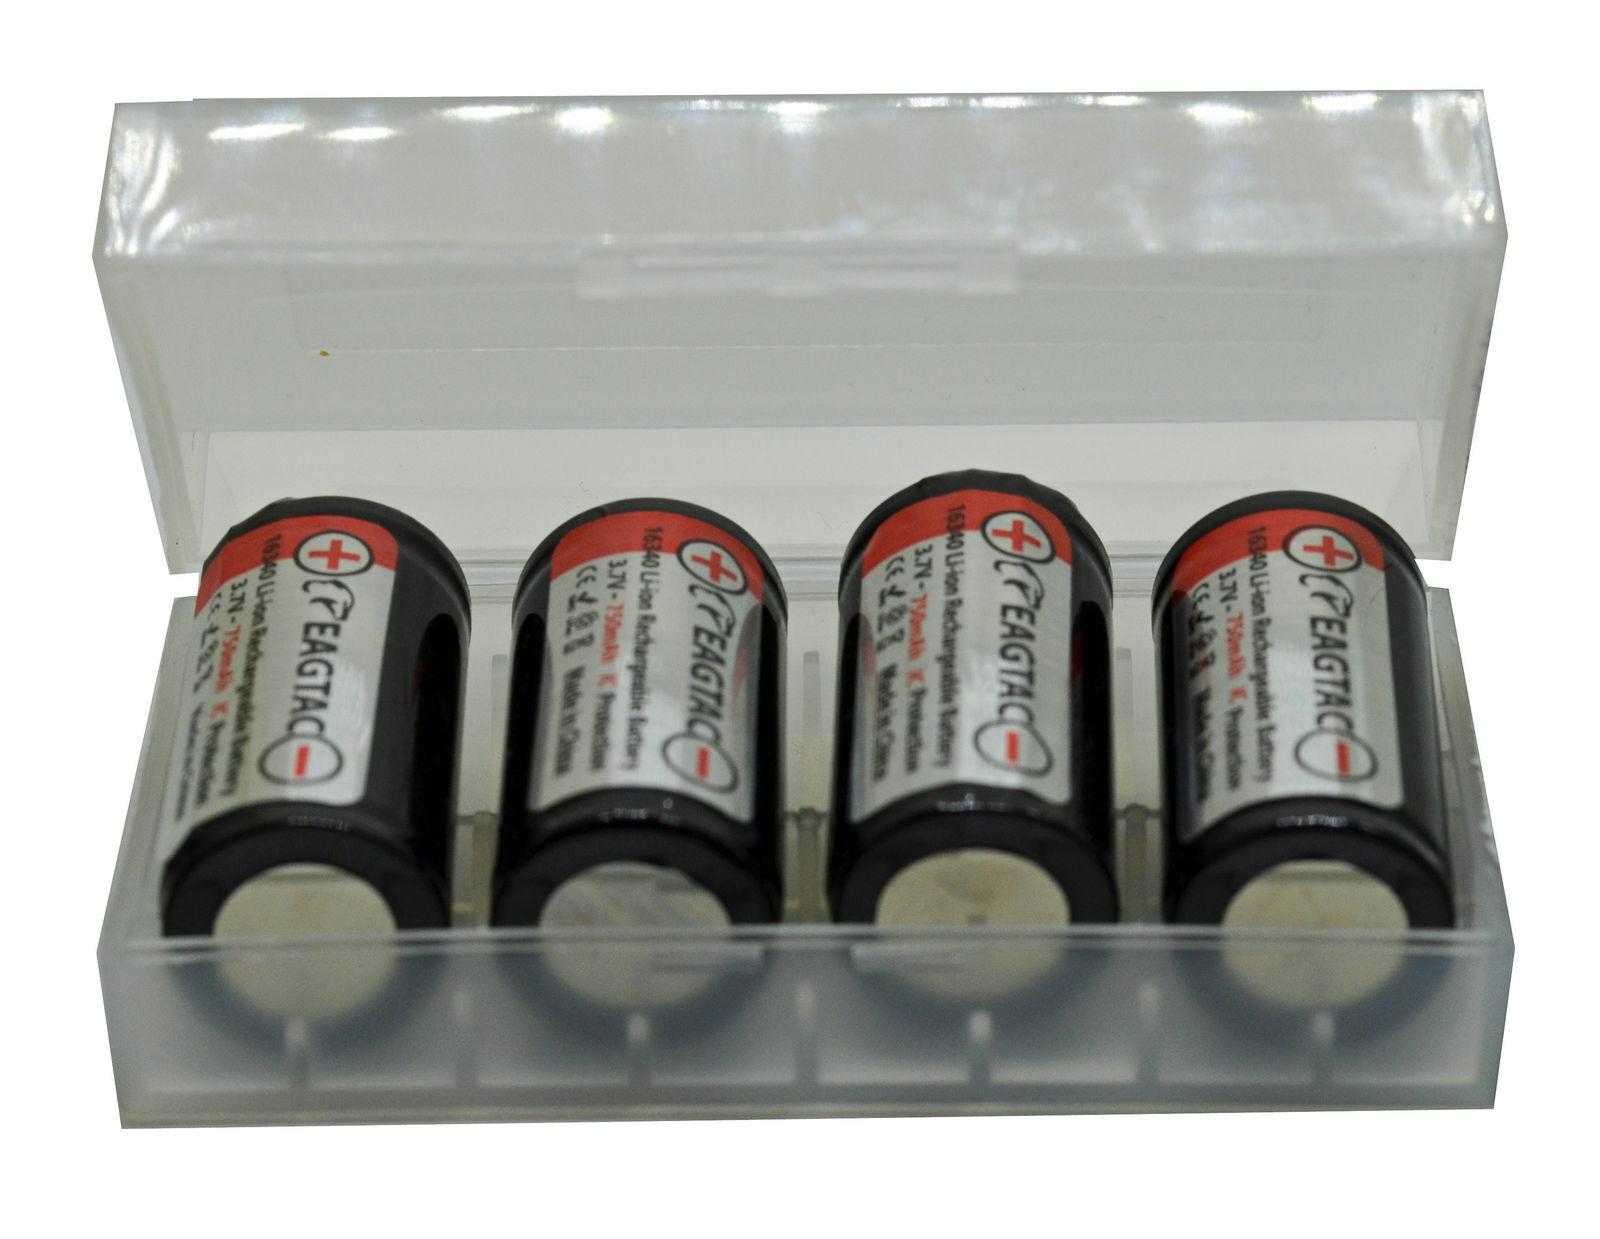 Eagtac LiIonio Batteria 16340RCR123 750 MAH 3,7V geschützt 4  Akkubox